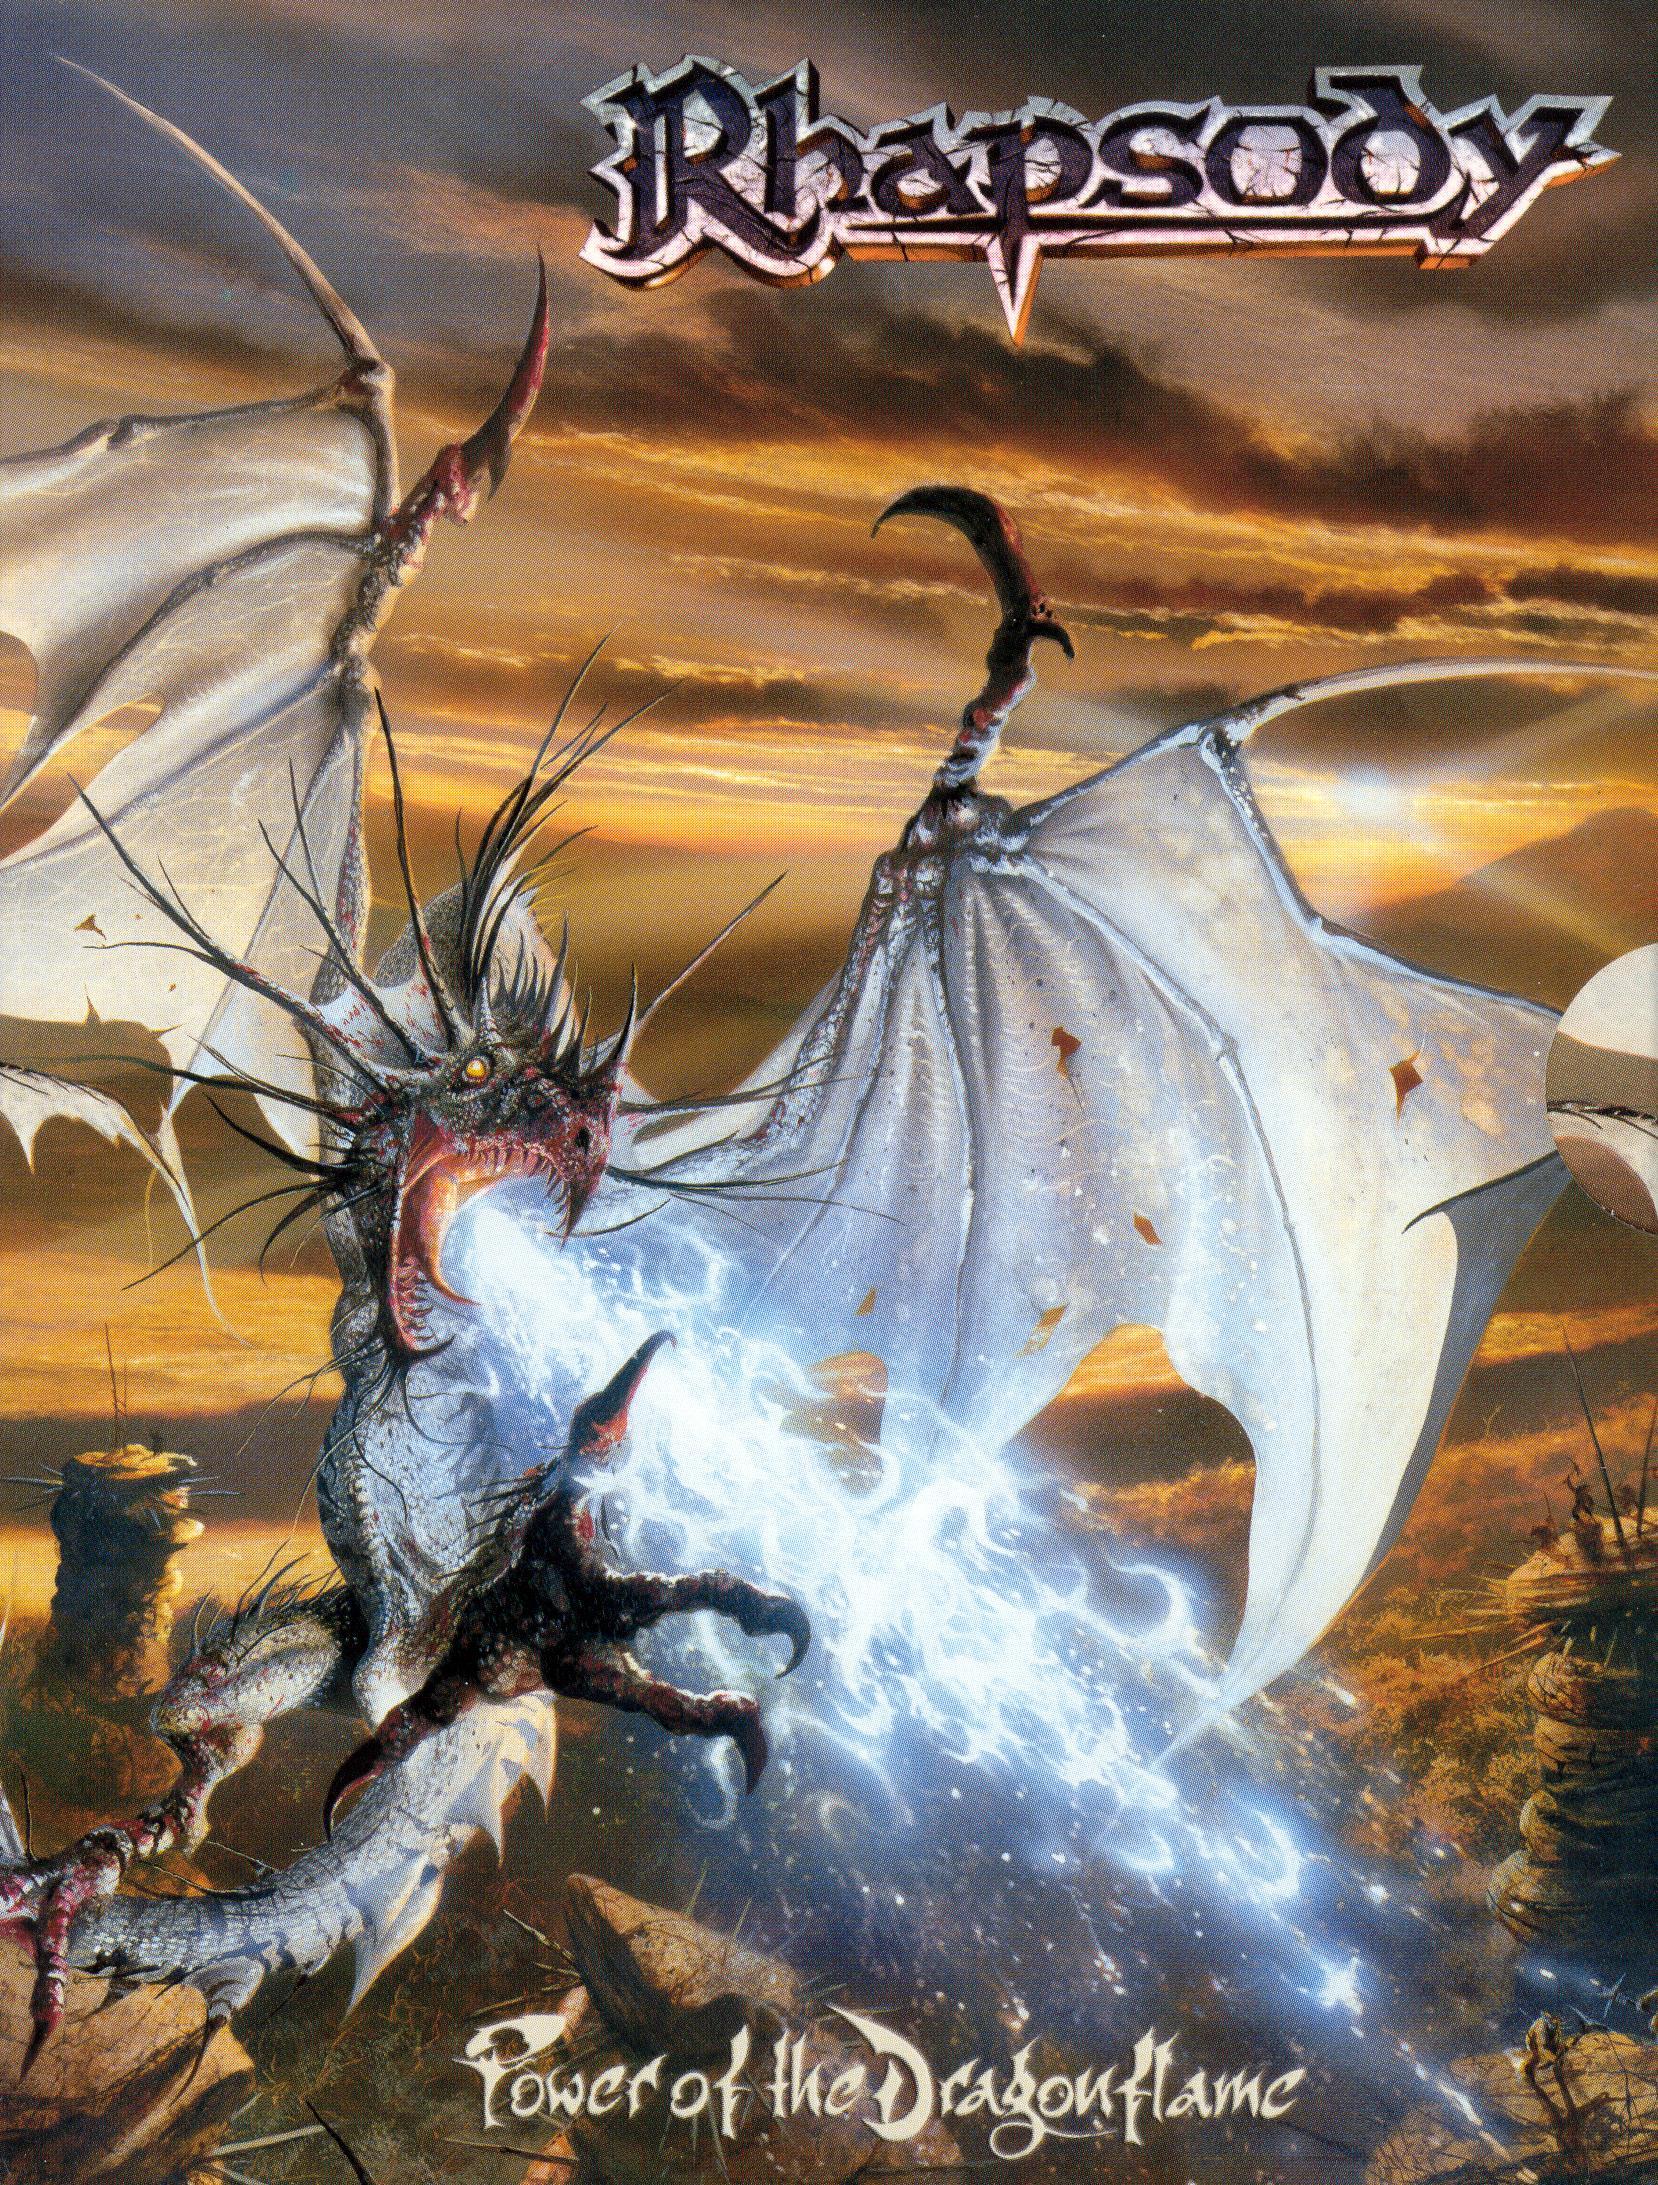 Rhapsody: Power of the Dragon Flame